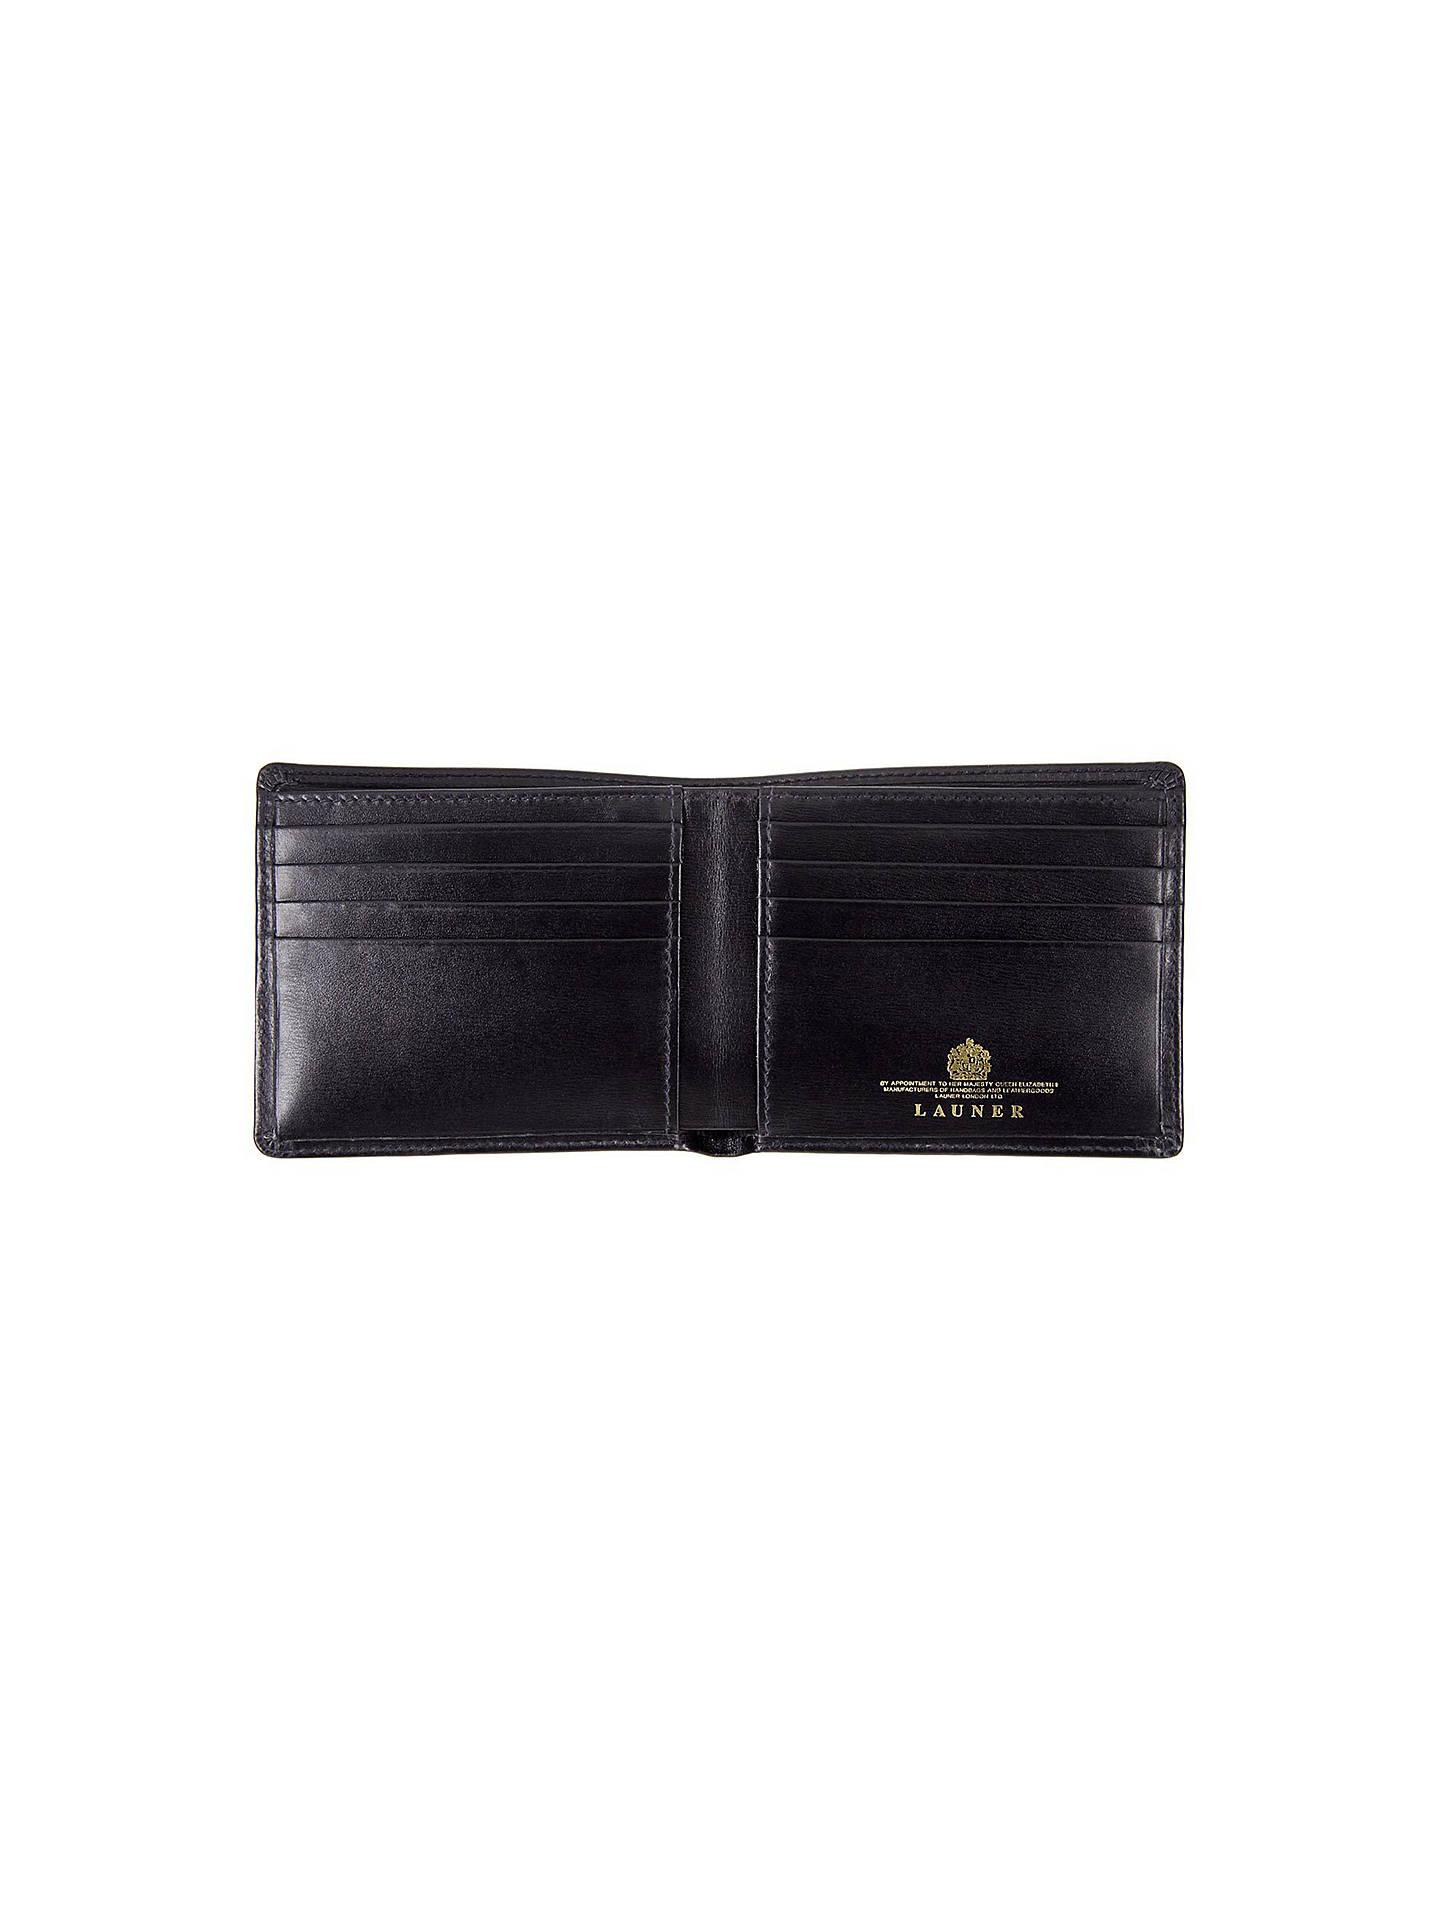 newest 0b8d8 f5f24 Launer Made in England Premium Leather Bi-Fold Wallet, Black at John ...